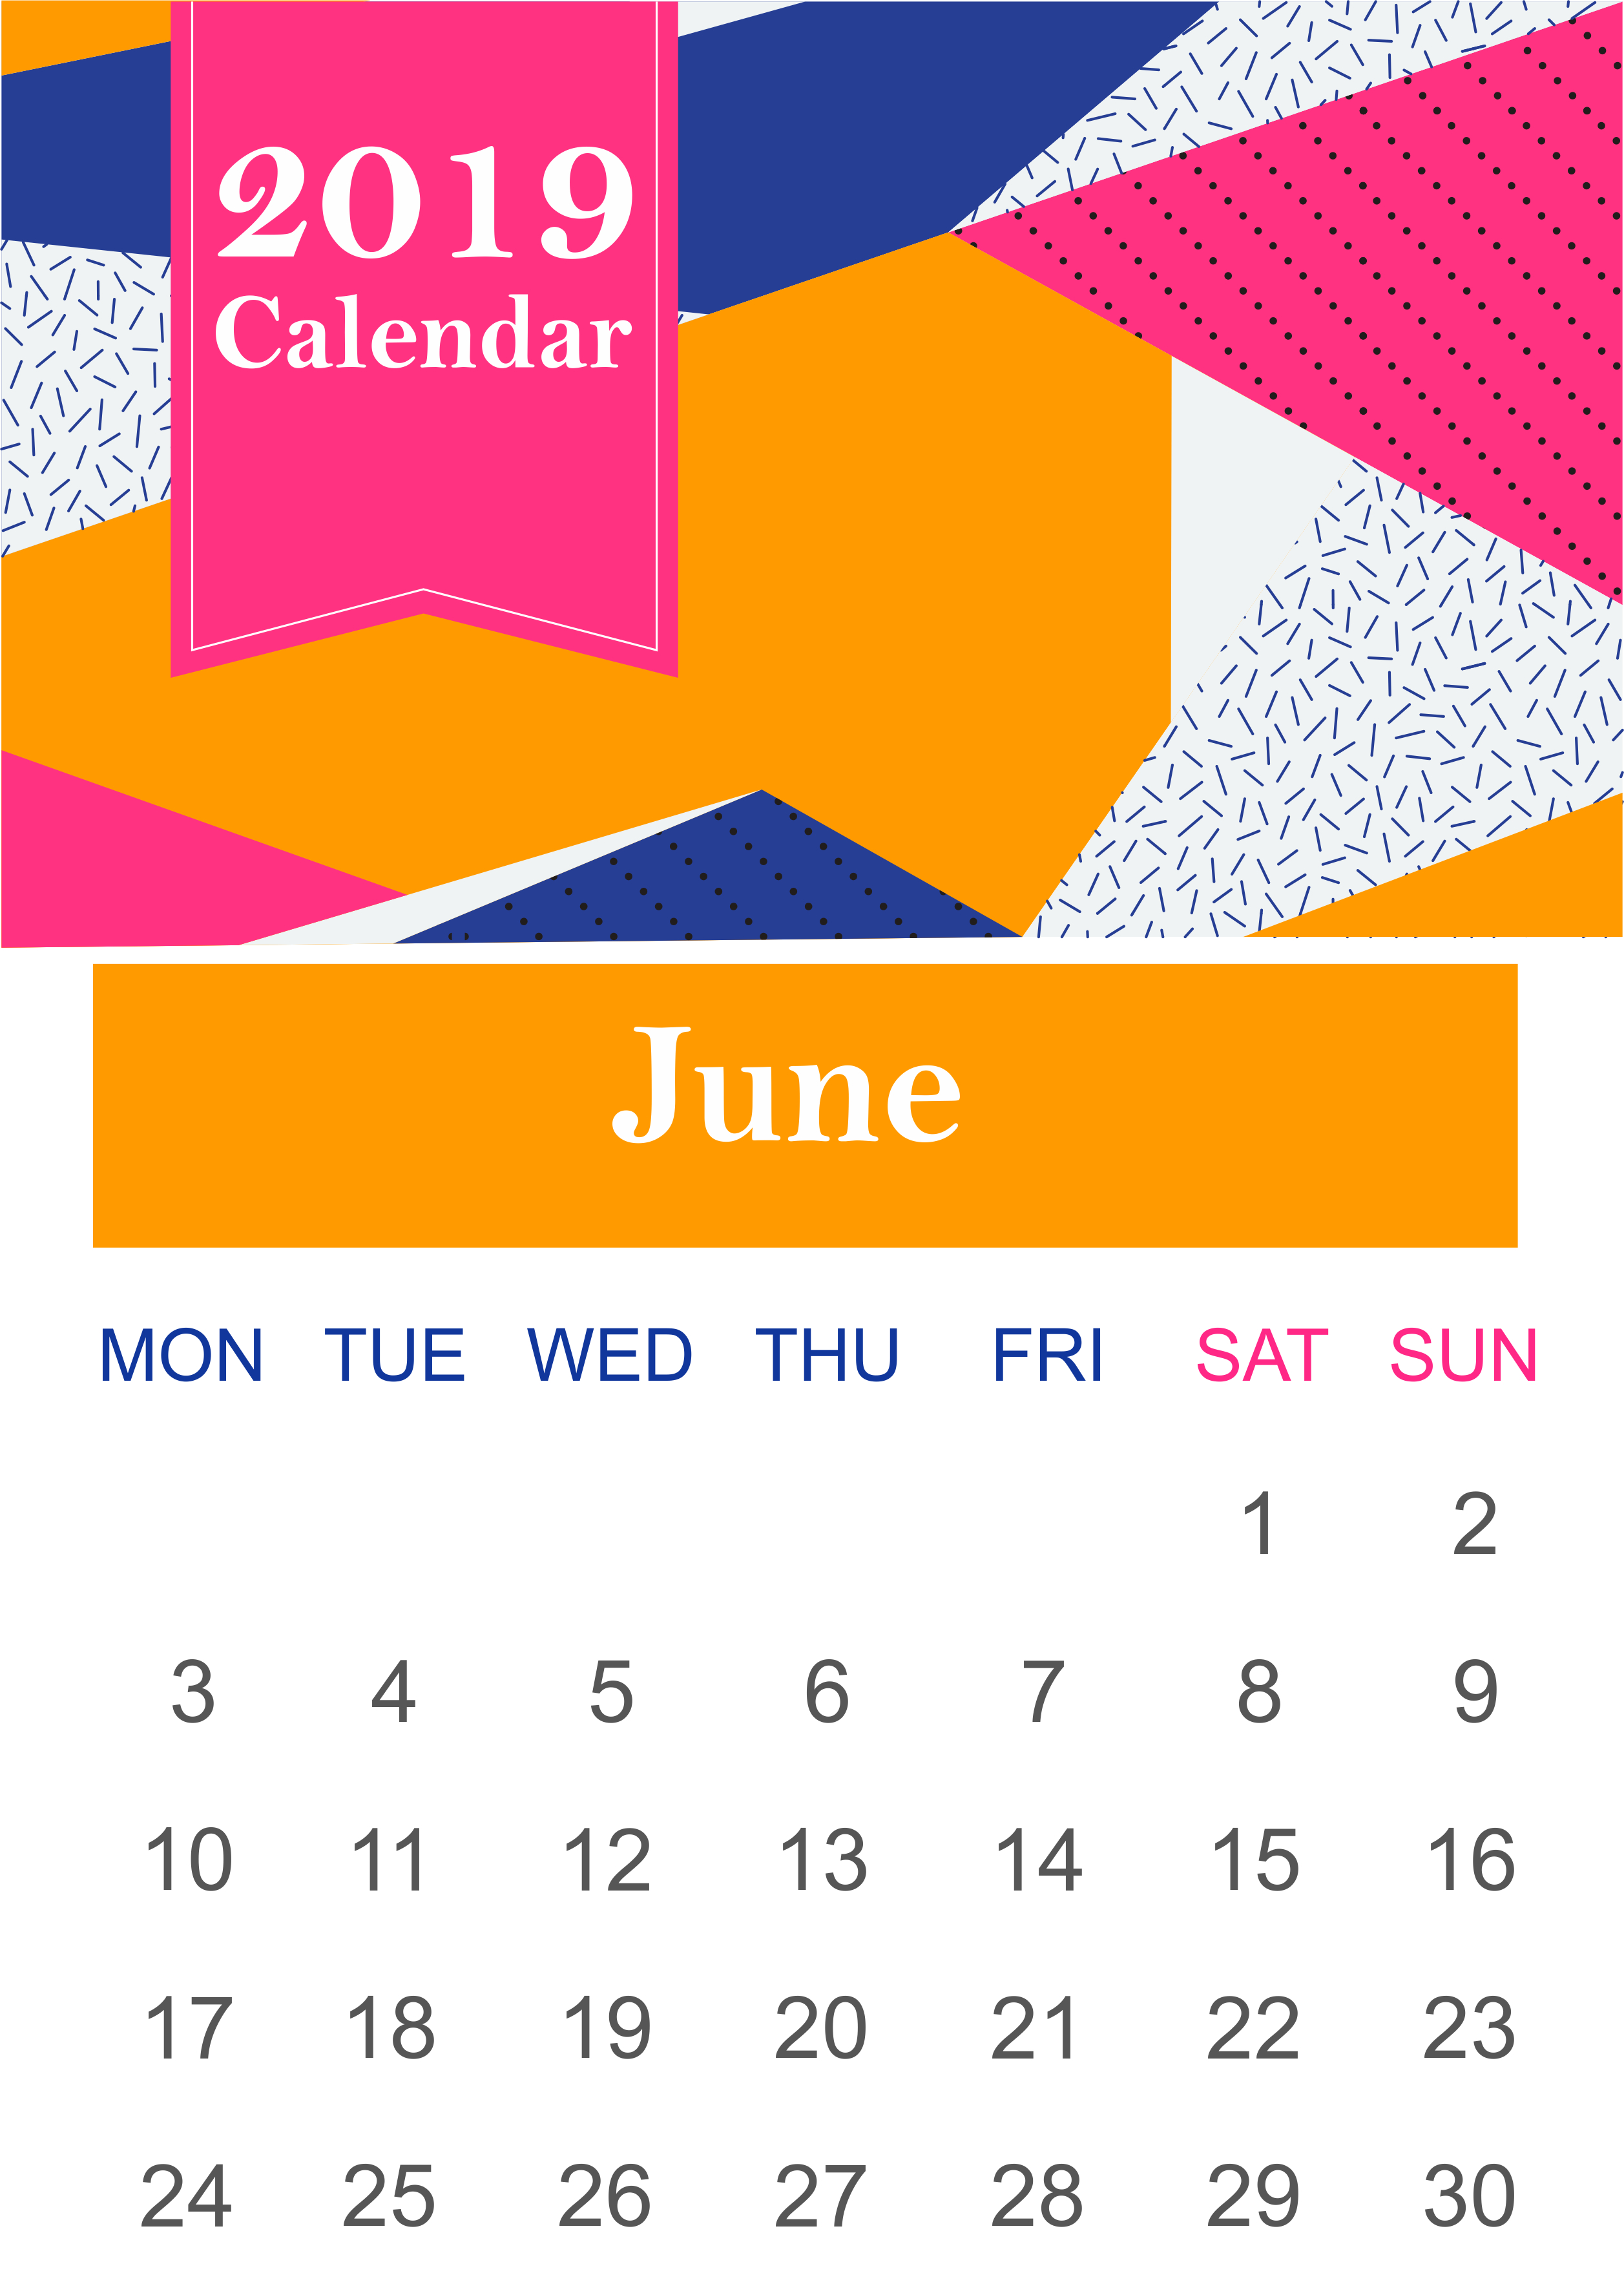 June 2019 Calendar Page – Free Printable Calendar, Templates And June 9 2019 Calendar